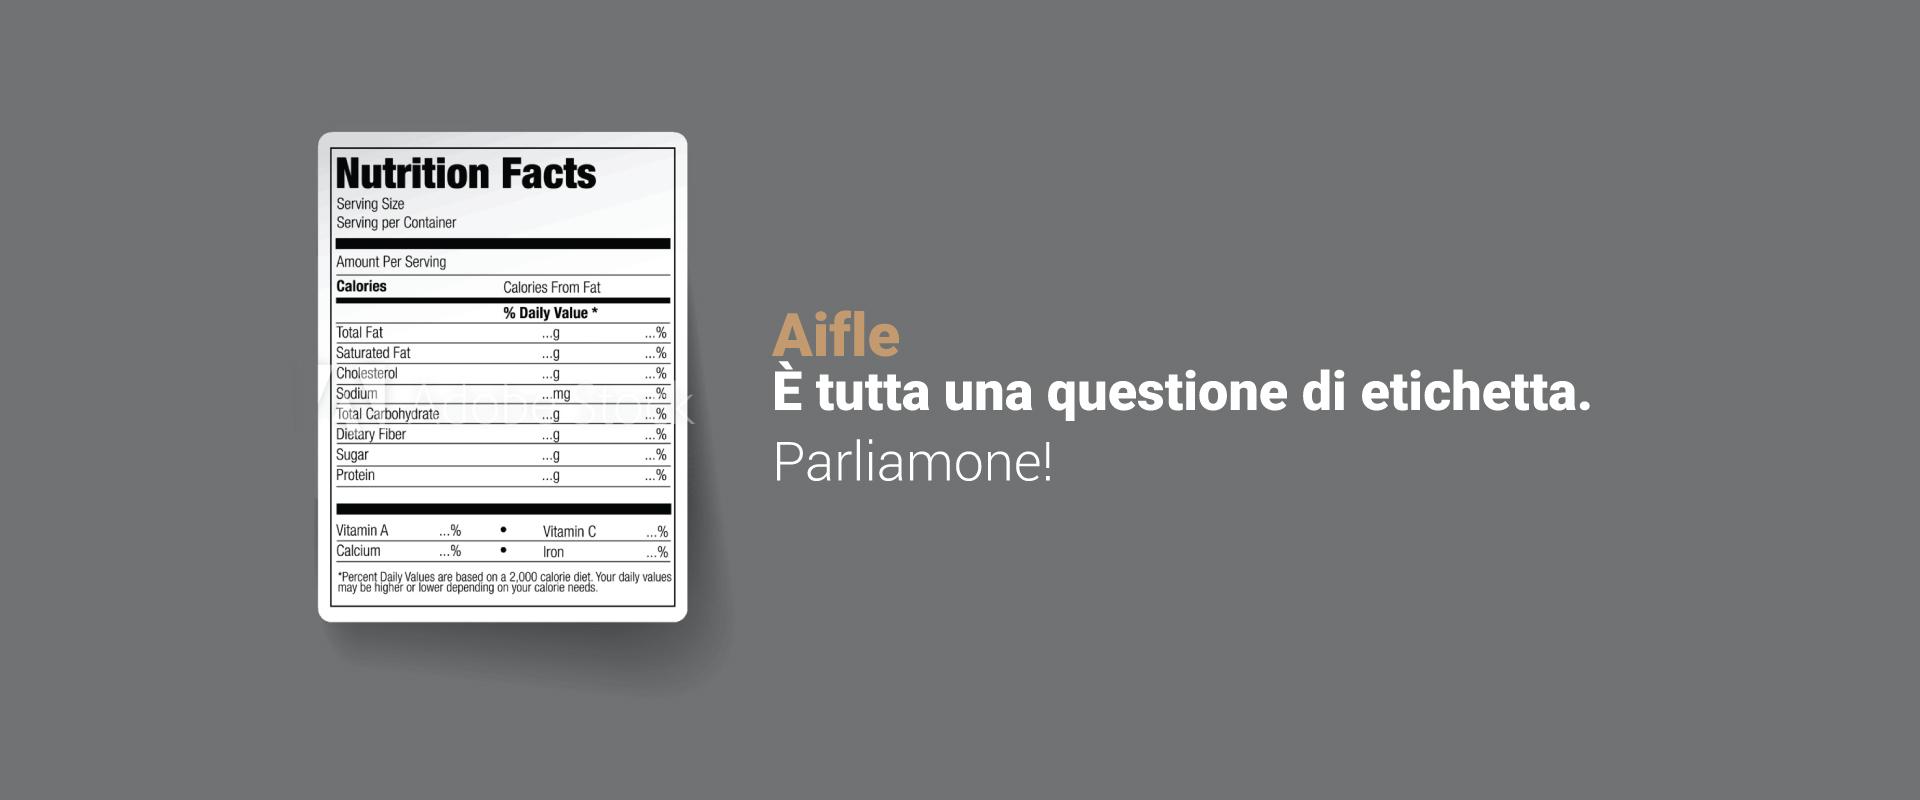 etichette-alimentari-il-forum-Aifle-D